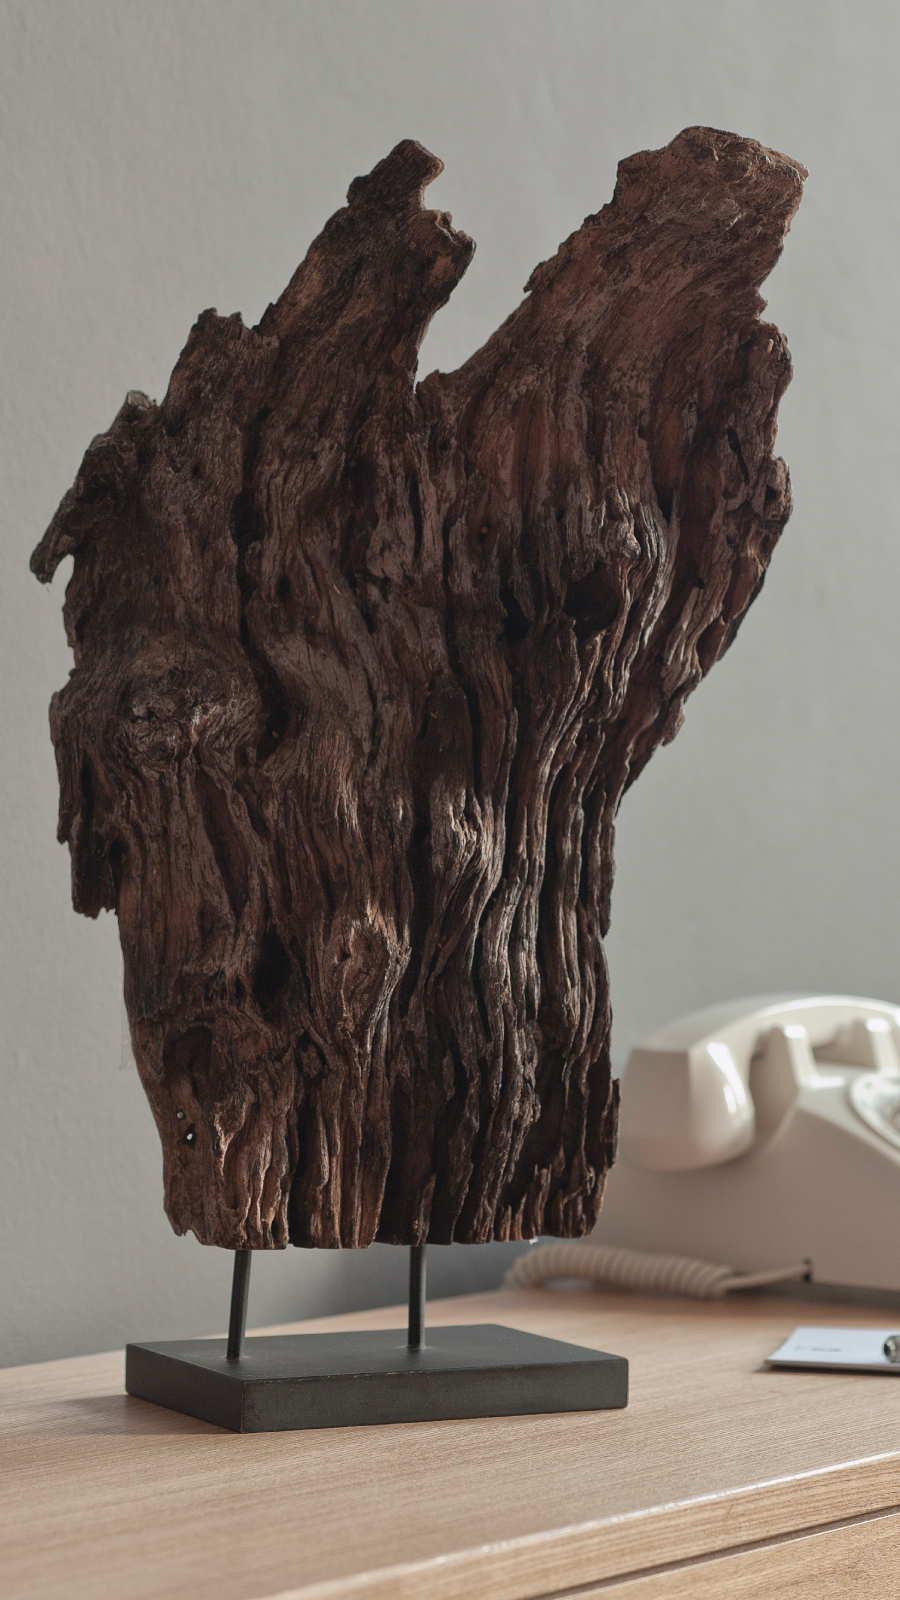 Lifestyle Hallway Driftwood Perfume Art Niche 9 16